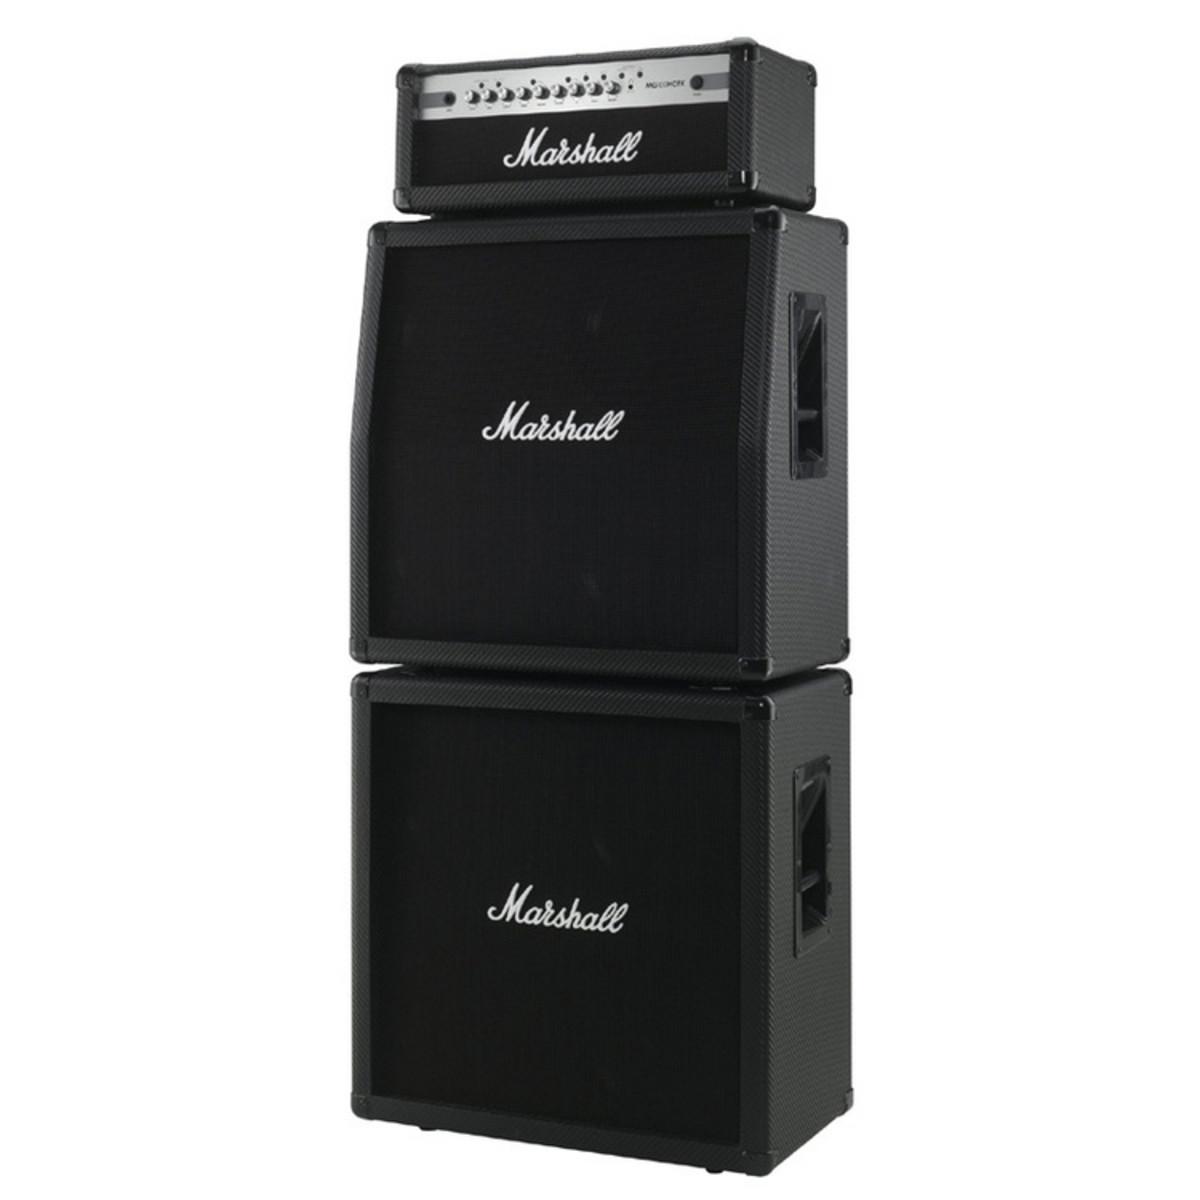 Marshall MG100HCFX Amp Head & Cabinet Full Stack Bundle at ...